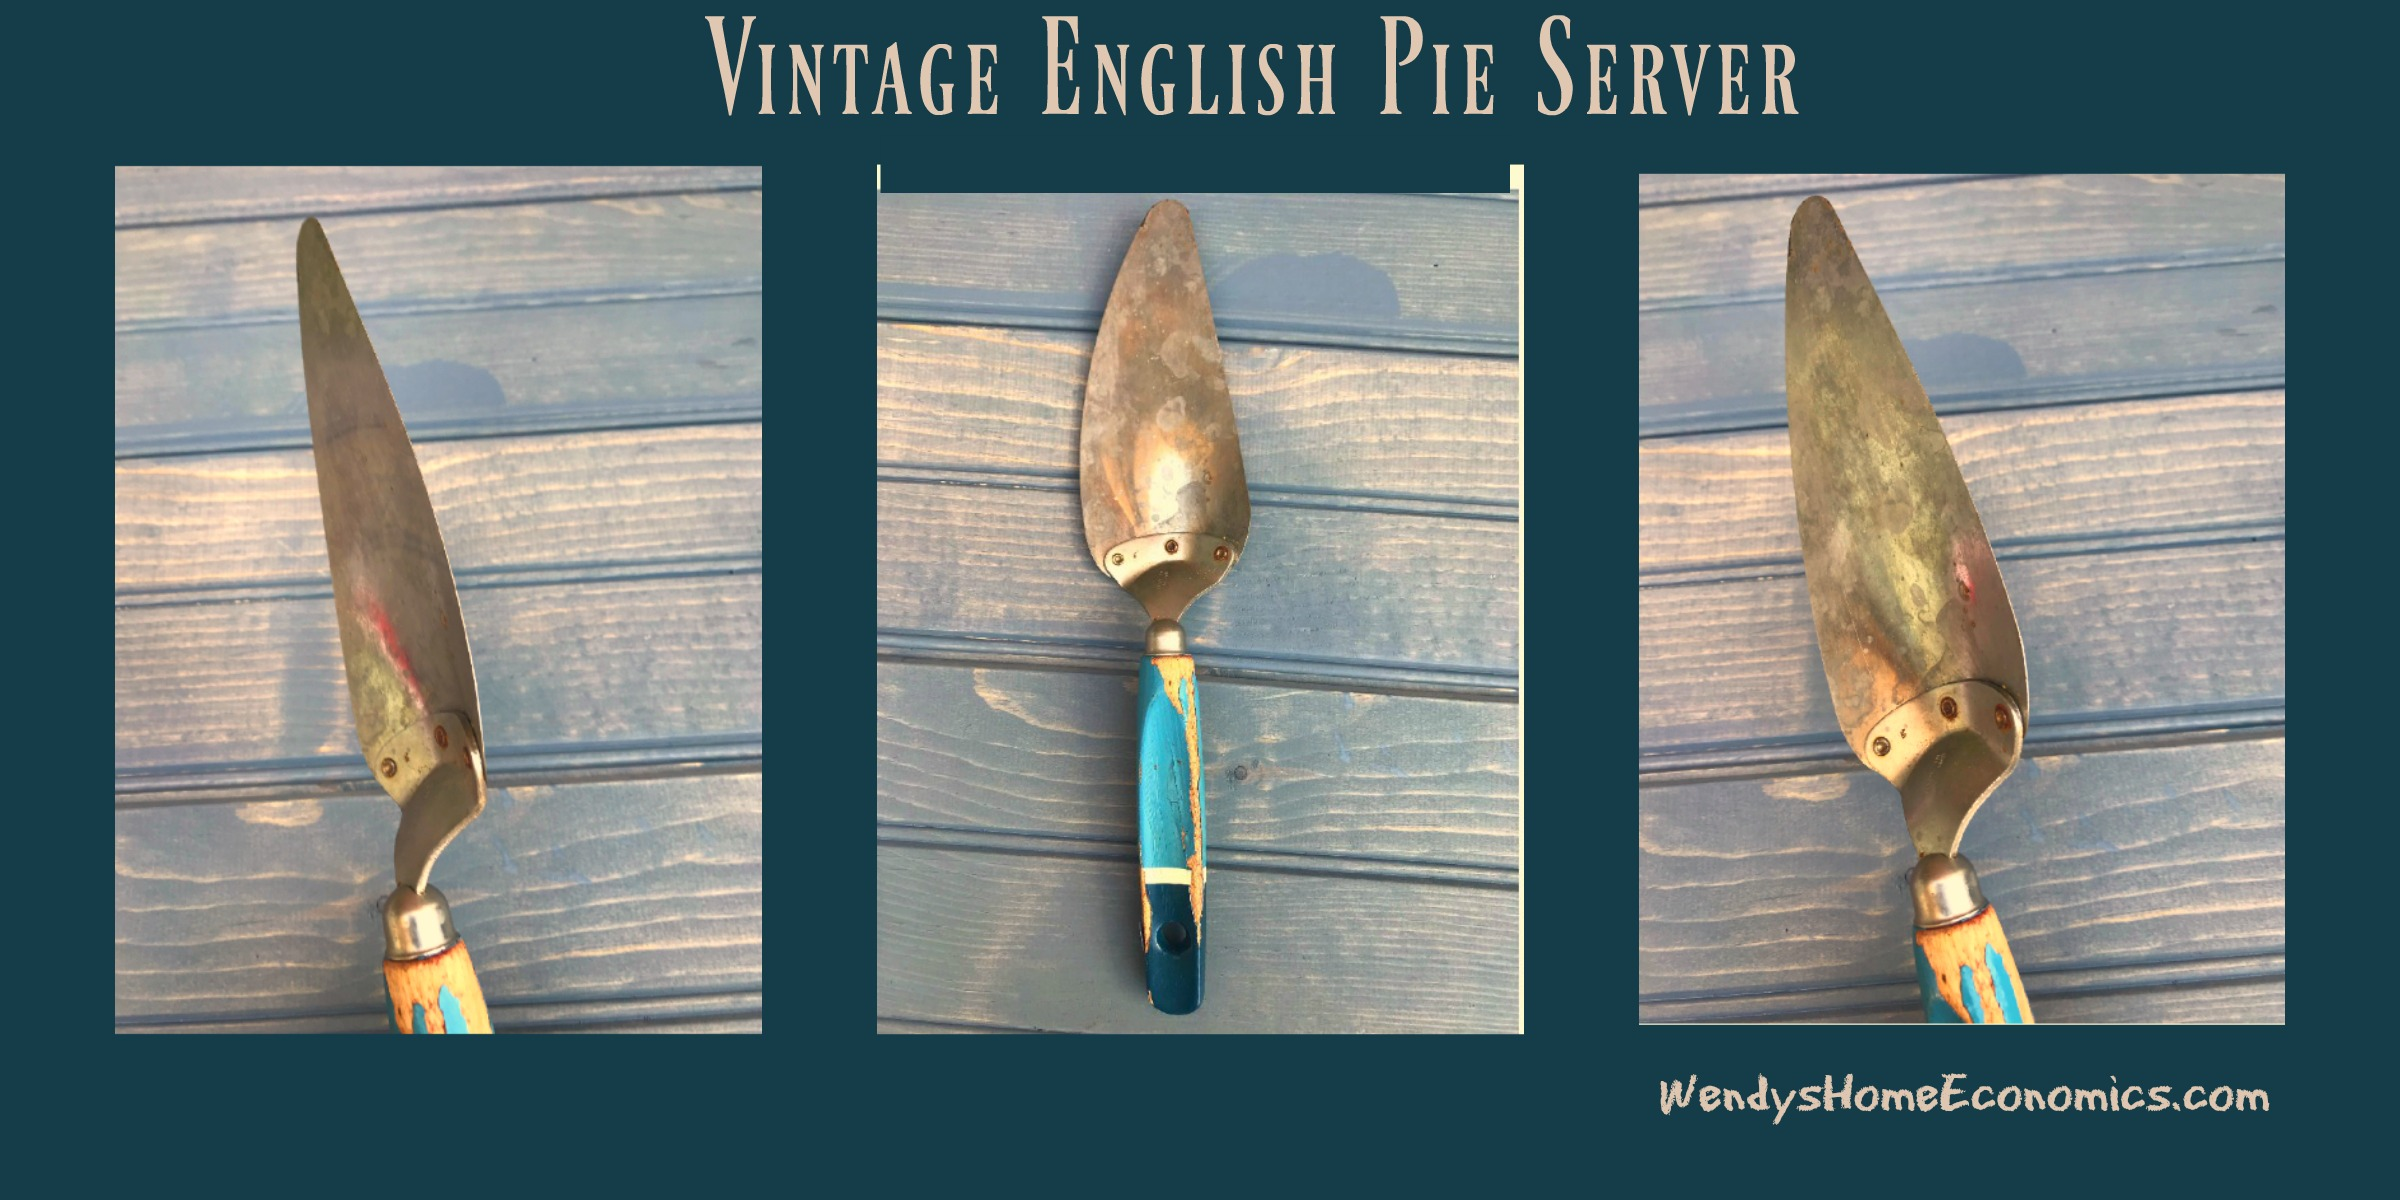 Vintage English Pie Server